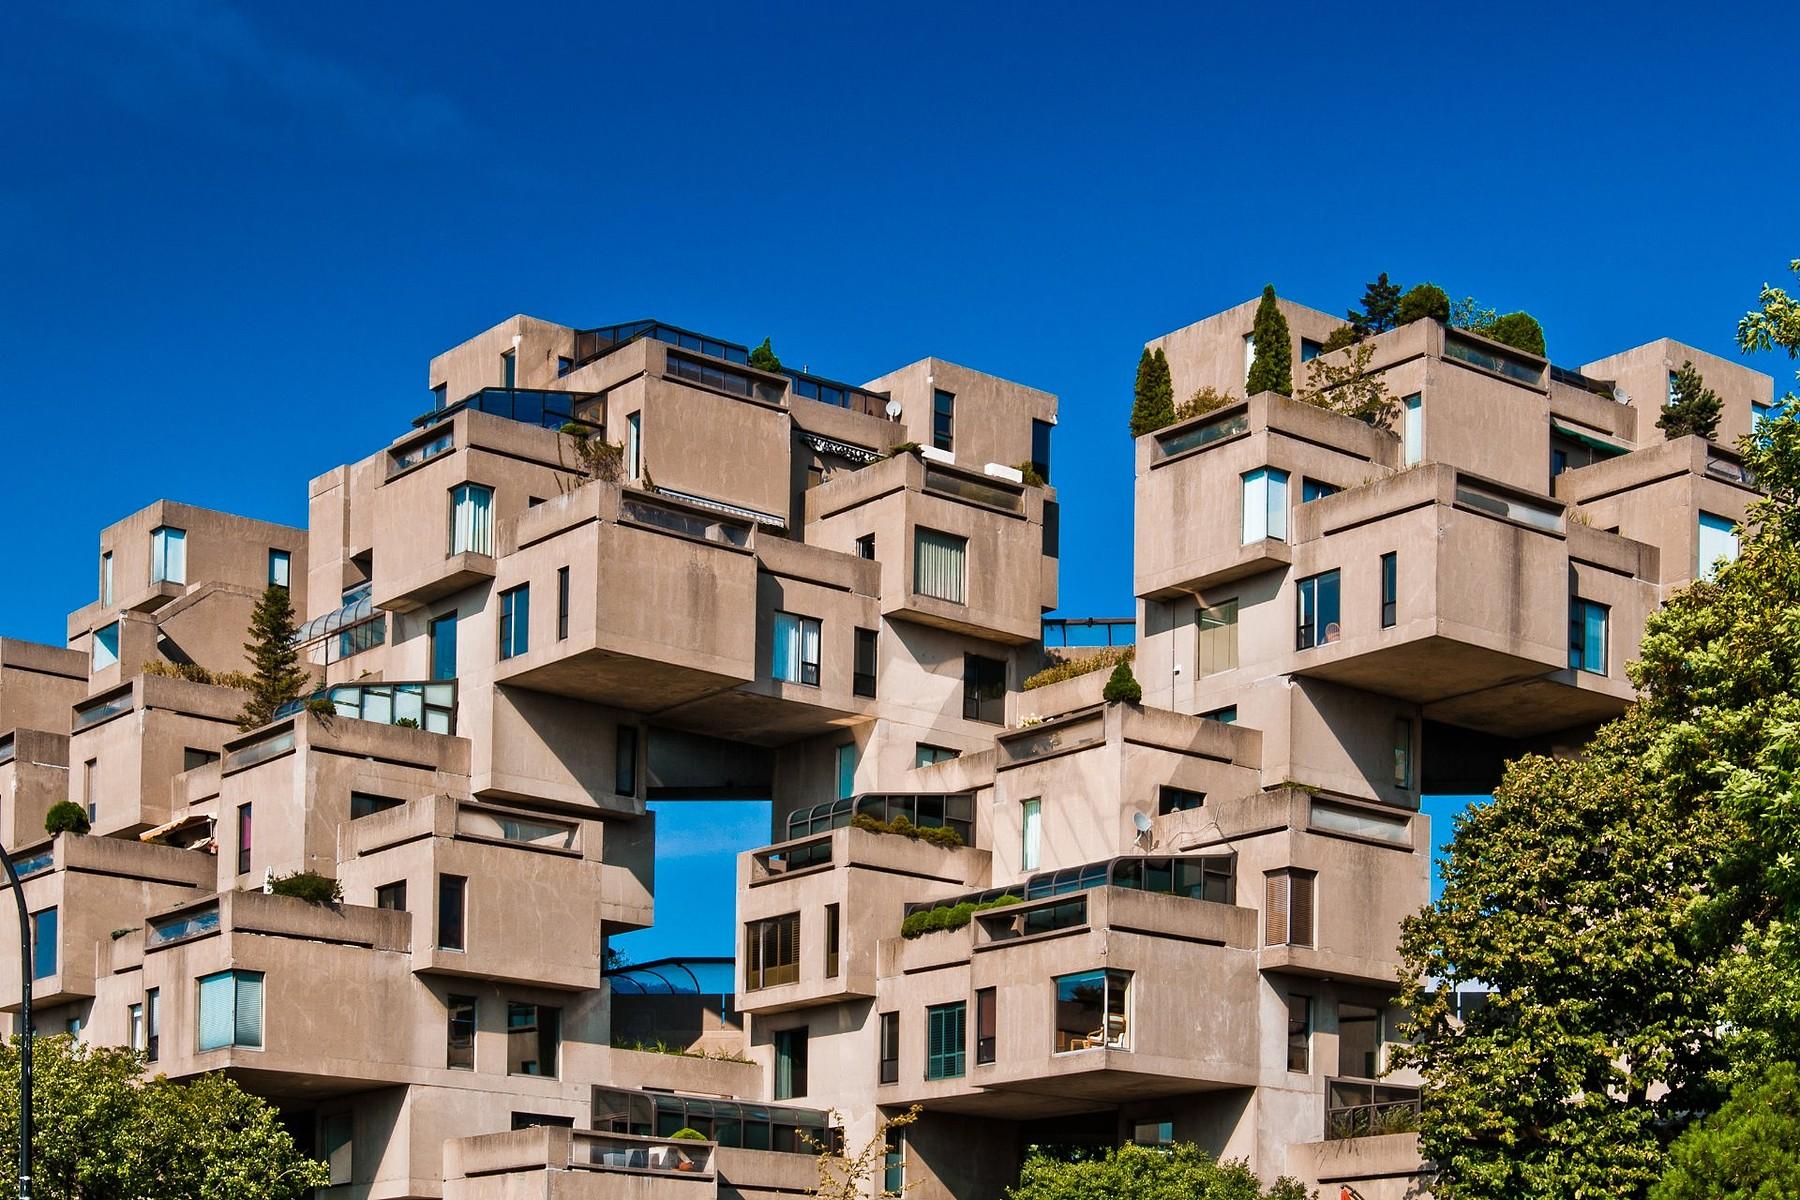 Nhà chung cư vì Bán tại Ville-Marie (Montréal), Montréal 2600 Av. Pierre-Dupuy, Apt. 611 Montreal, Quebec H3C3R6 Canada